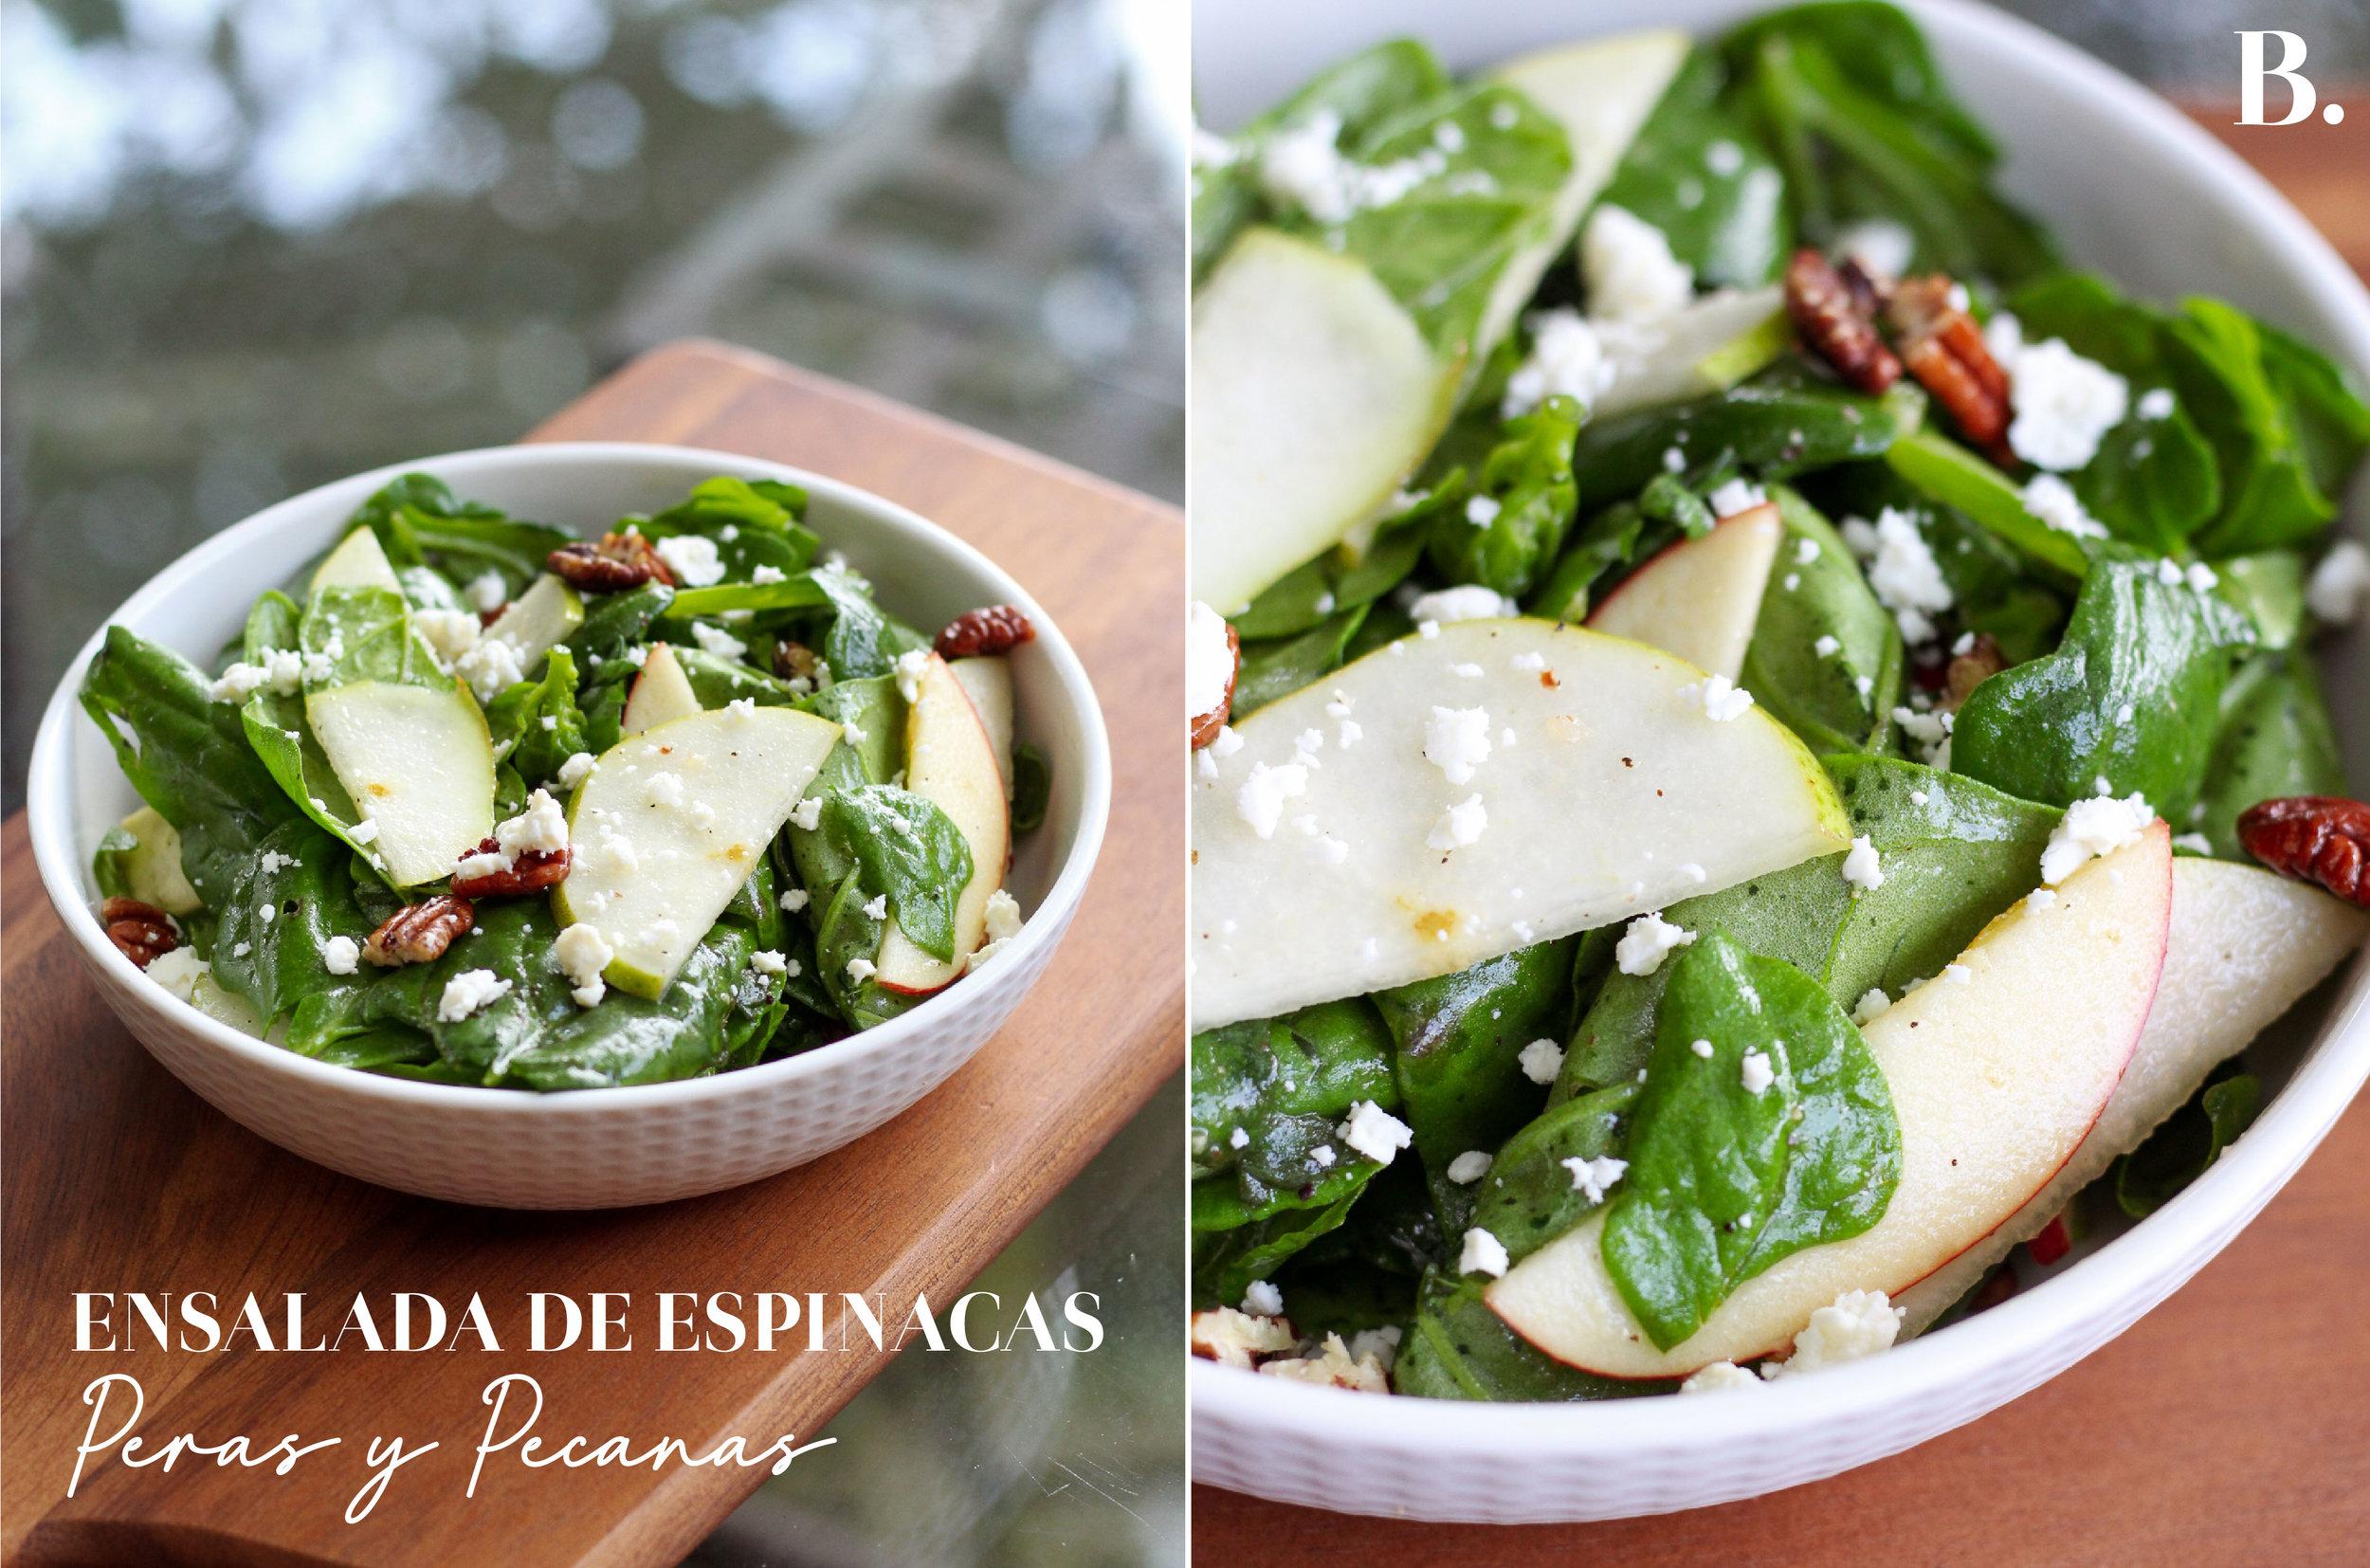 ensalada-espinacas-pecanas.jpg